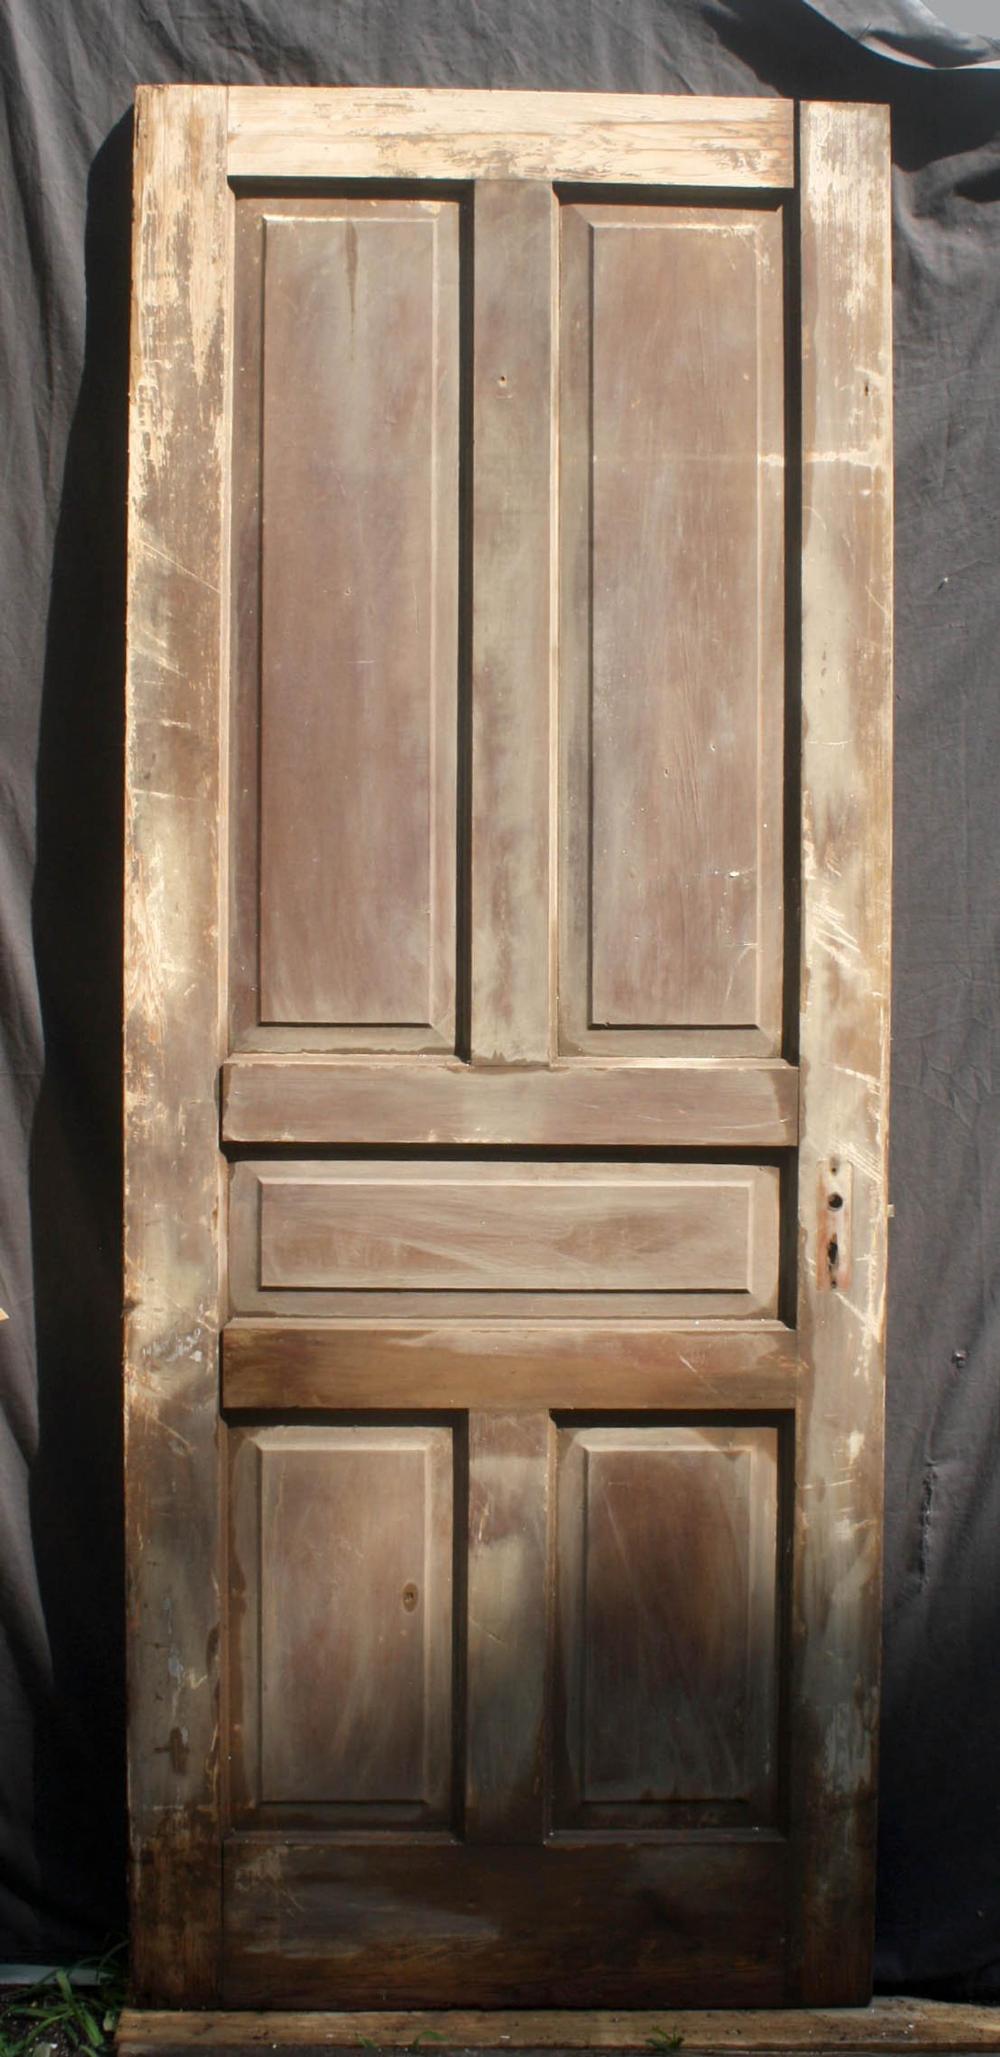 salvaged wood doors on 32 X81 Antique Vintage Salvaged Reclaimed Old Victorian Solid Wood Wooden Interior Door 5 Raised Panels In 2021 Wooden Doors Interior Old Wood Doors Antiques